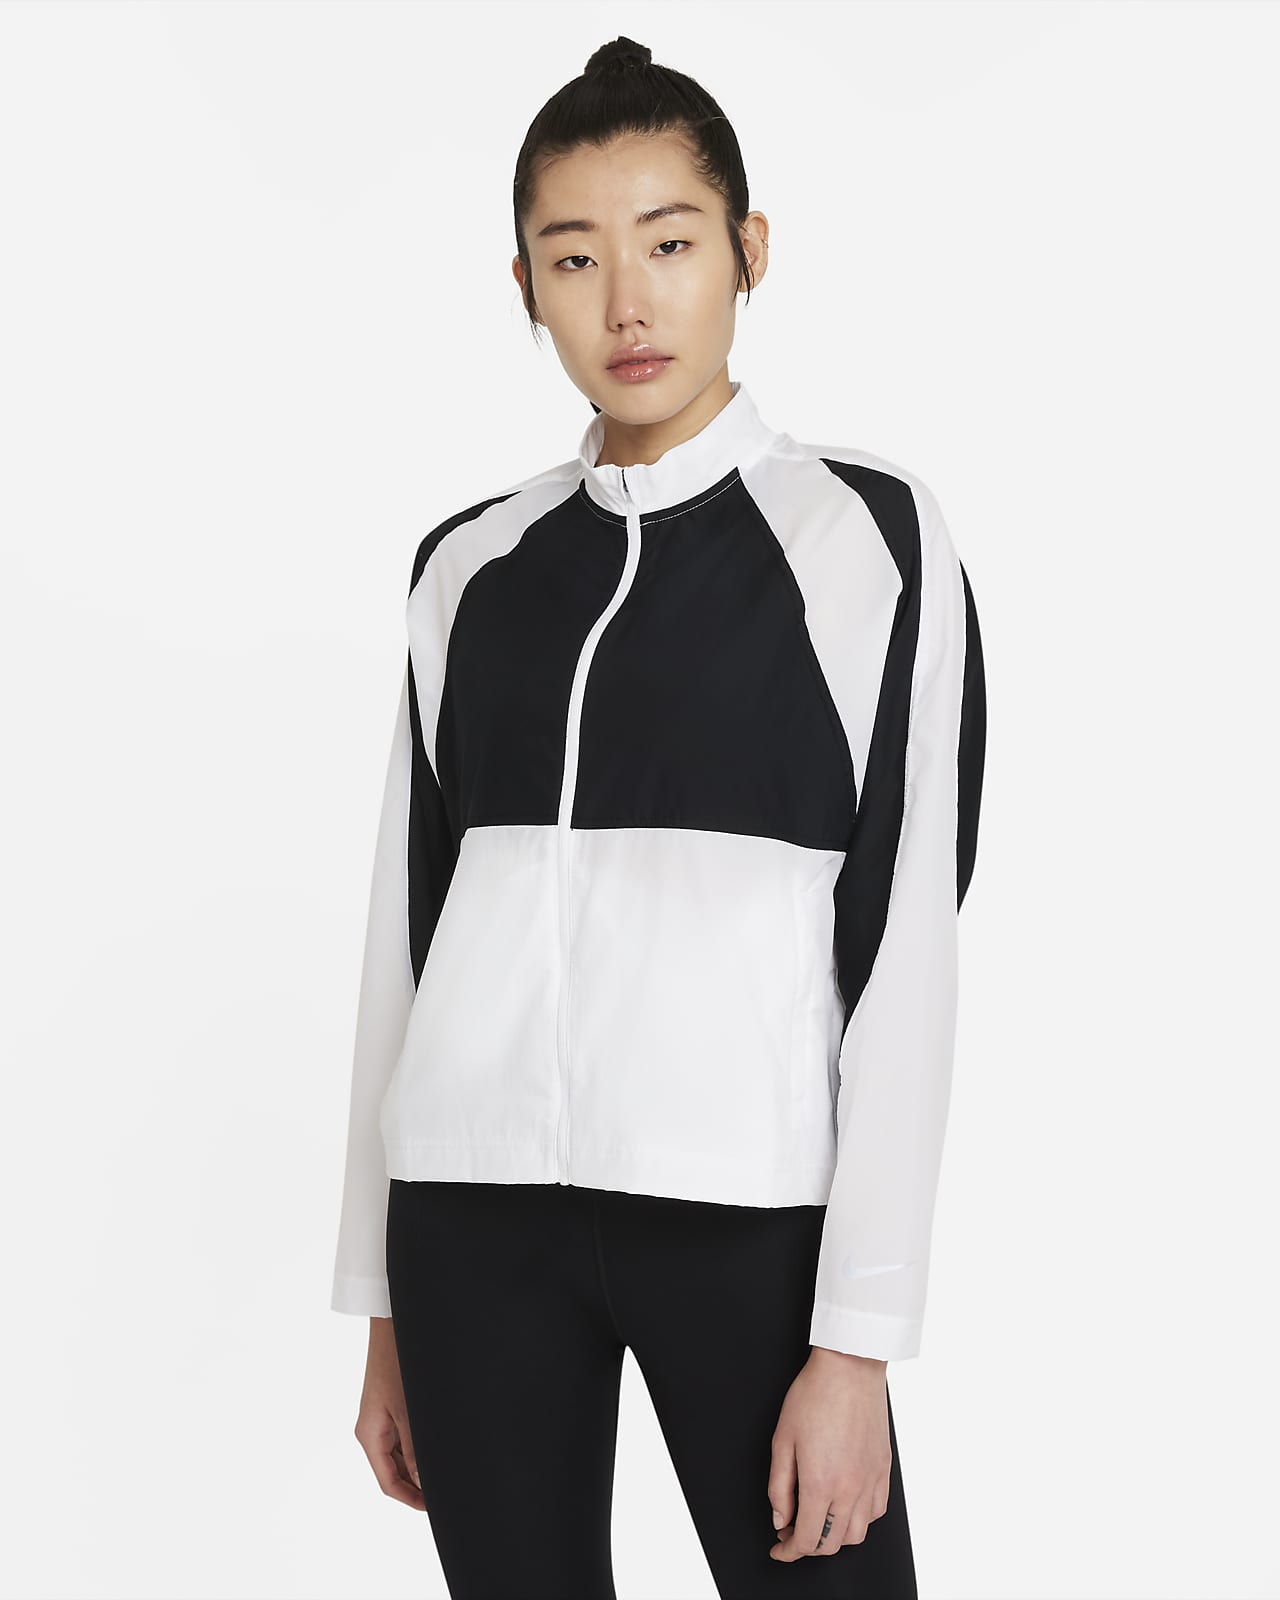 Nike Retro Women's Running Tracksuit Jacket